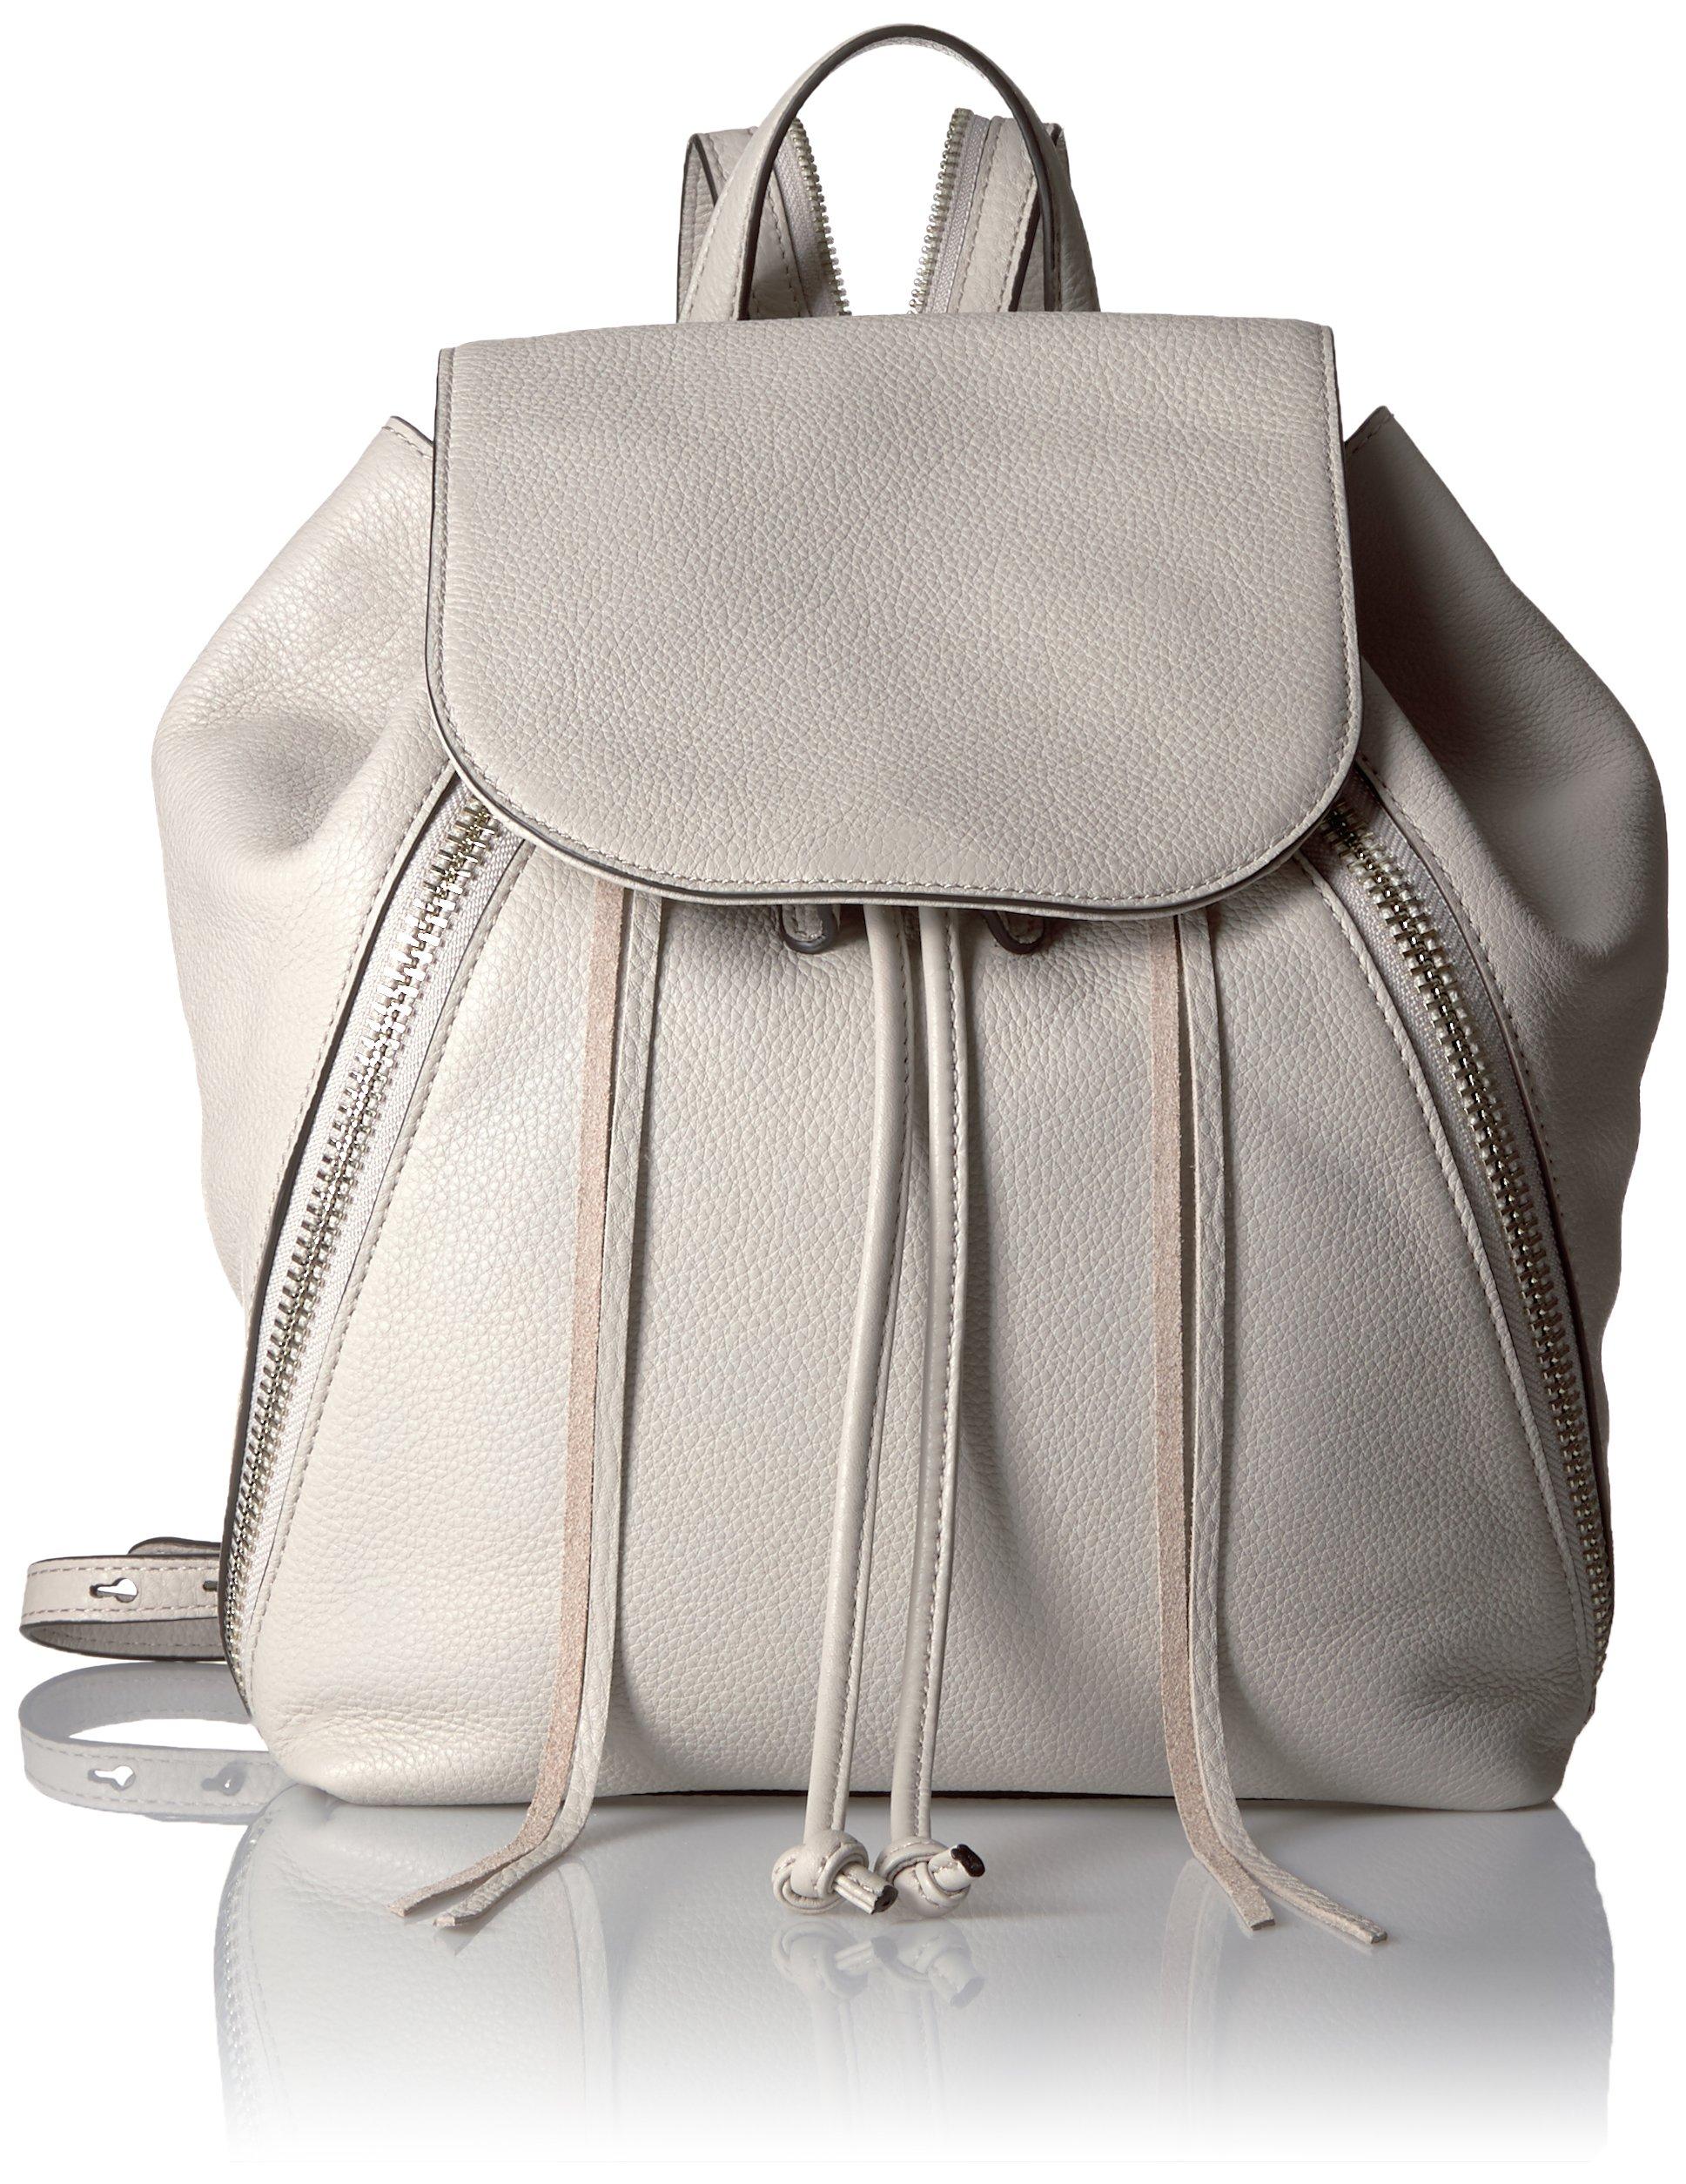 Rebecca Minkoff Bryn Back pack, Putty, One Size